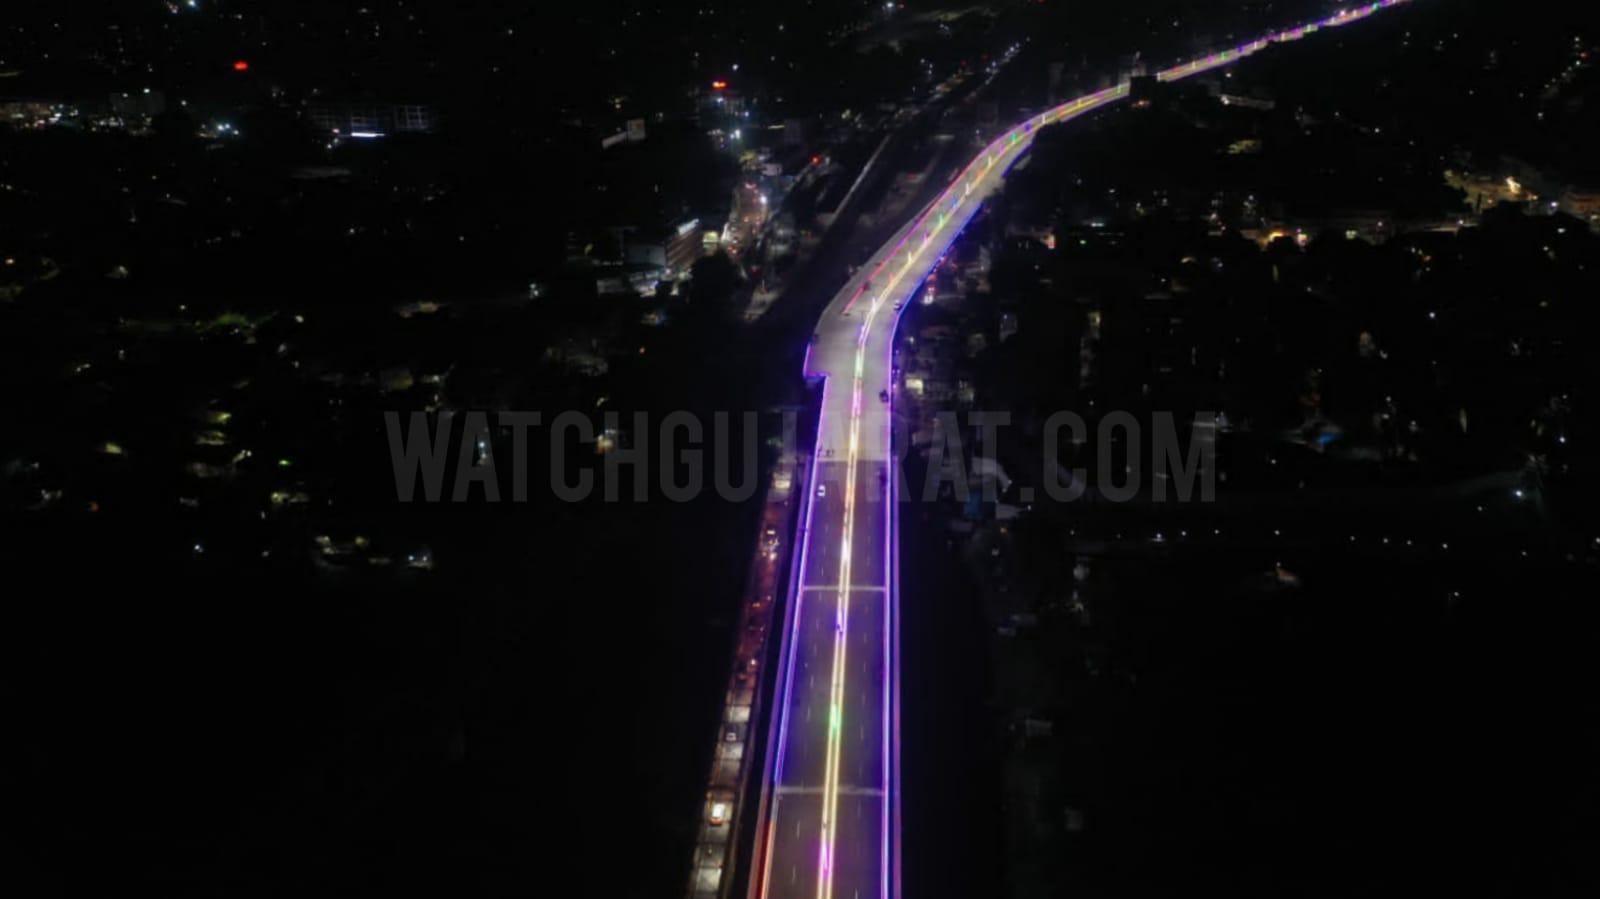 Gujarat newly inaugrated Narmada maiya bridge